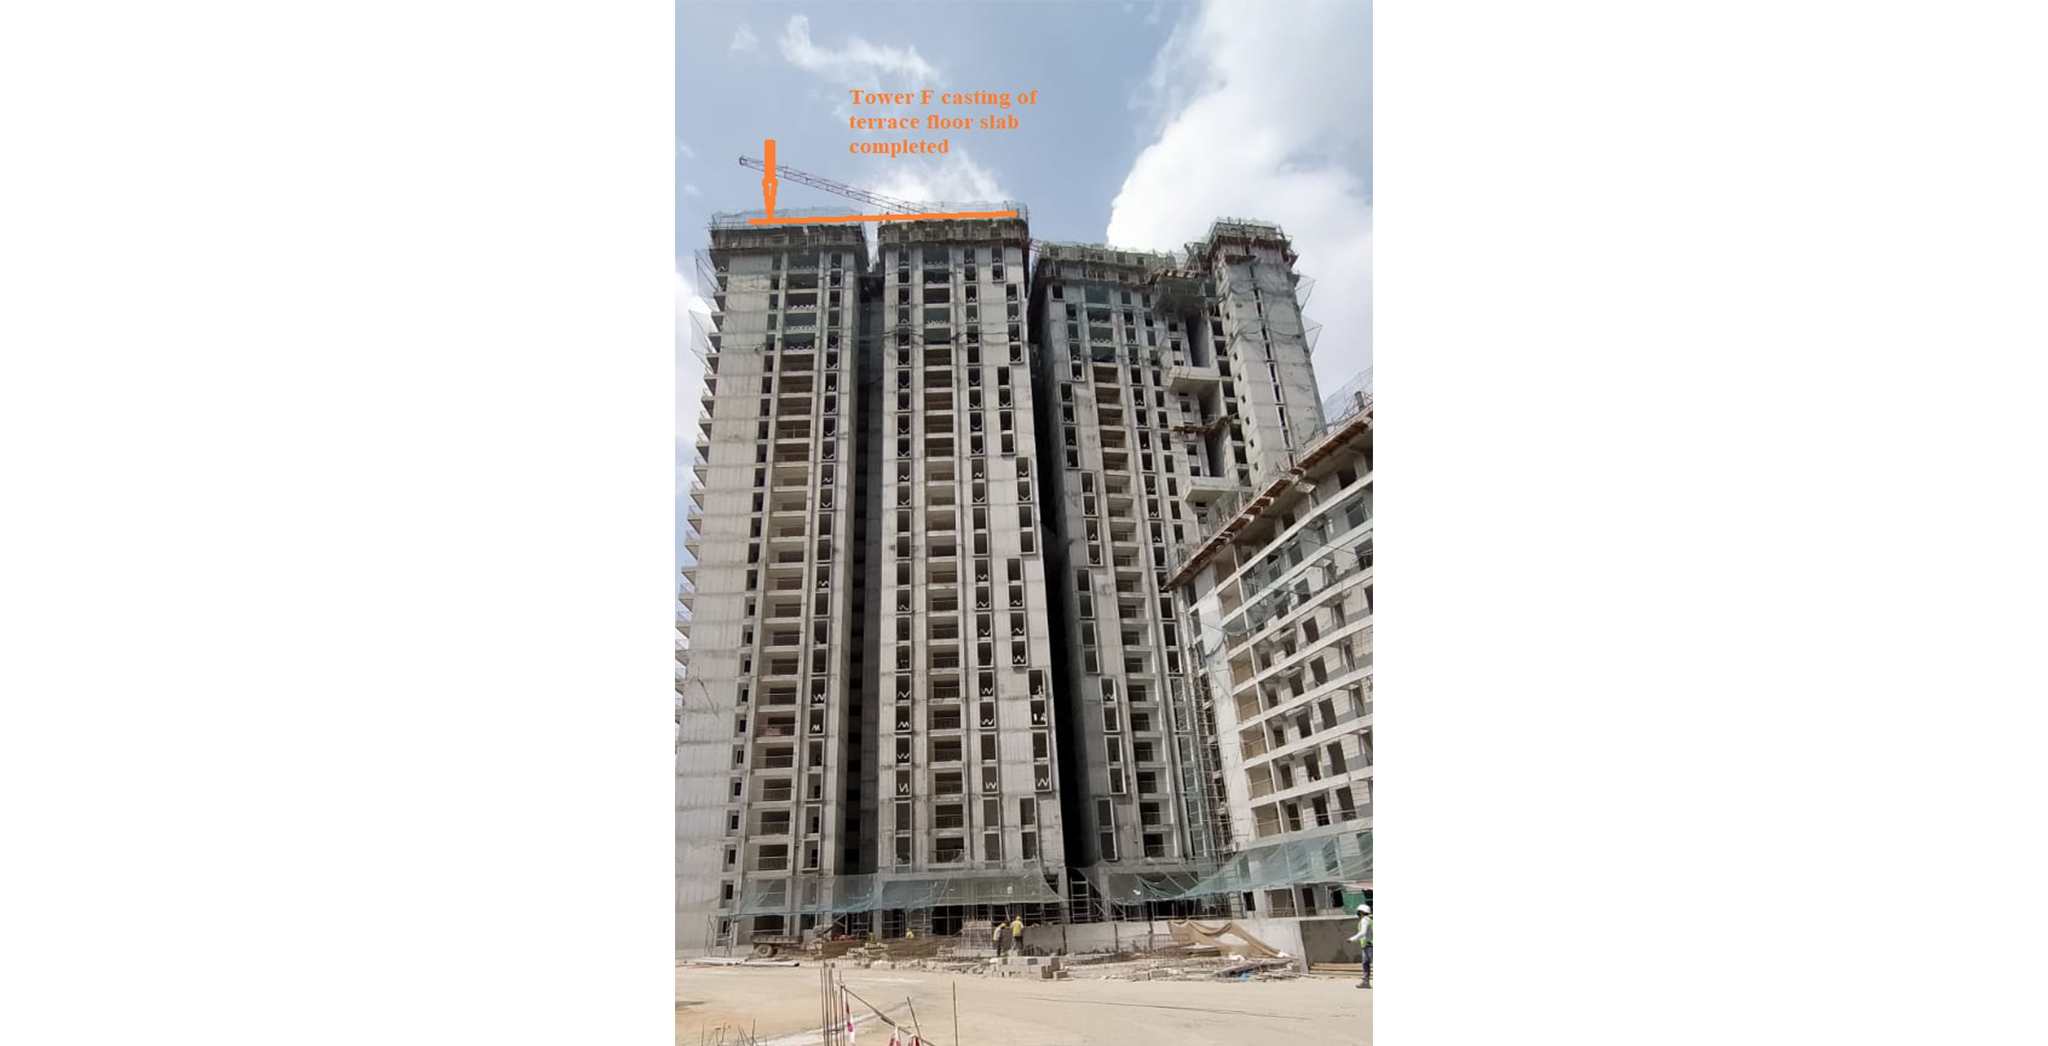 Apr 2021 - Serene F – On Casting of Terrace Floor Slab - Status as of 15th April 2020